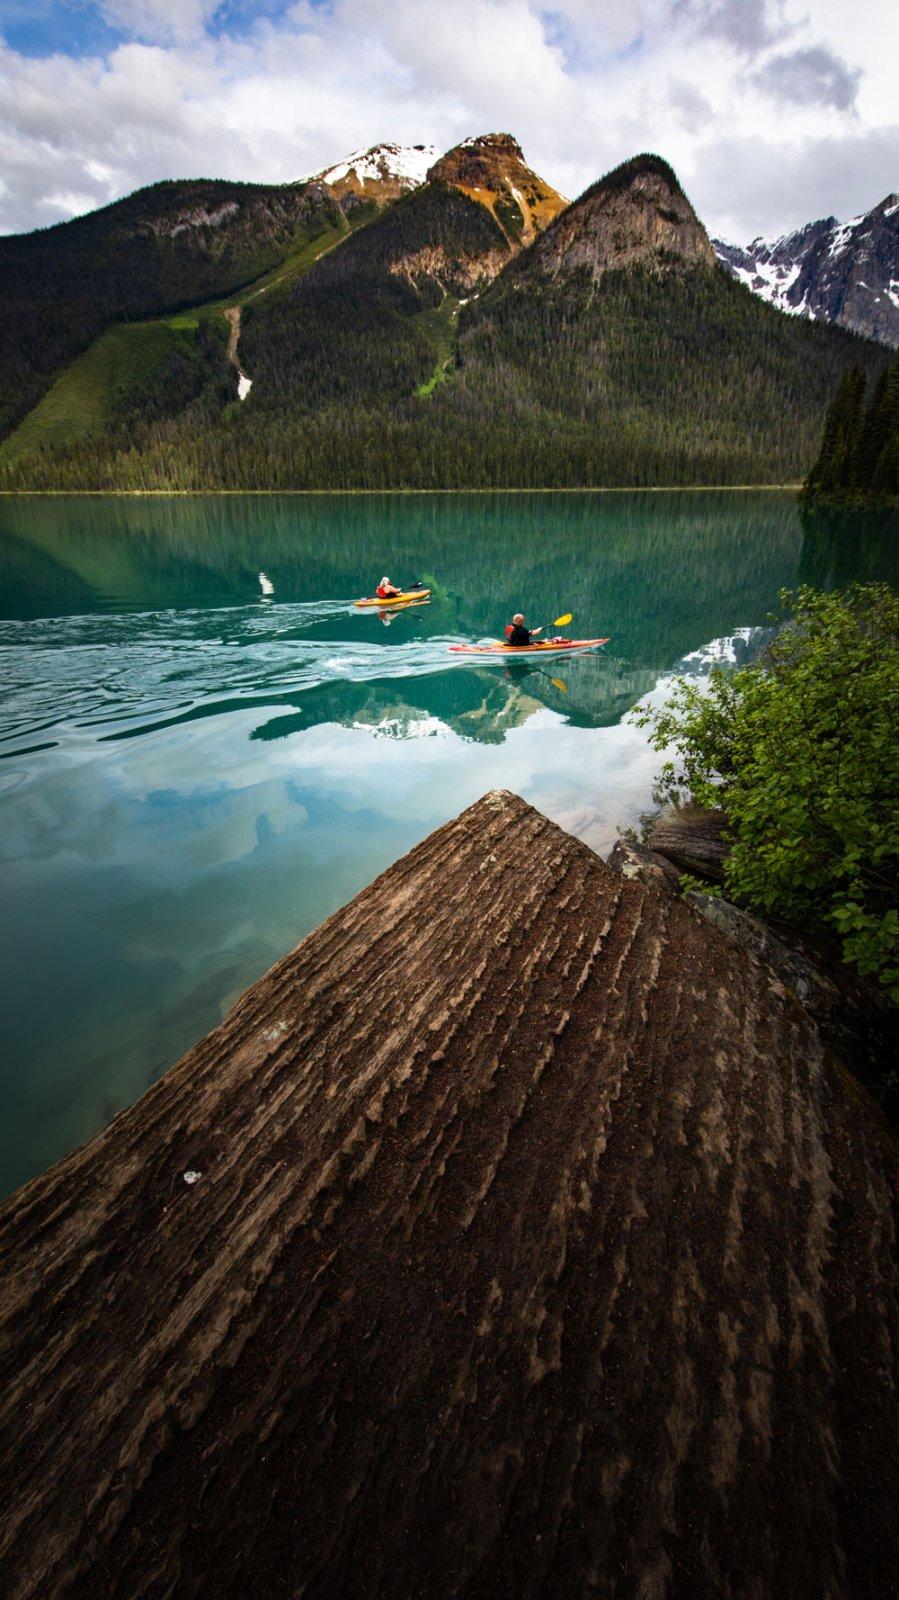 two kayakers paddling through calm water